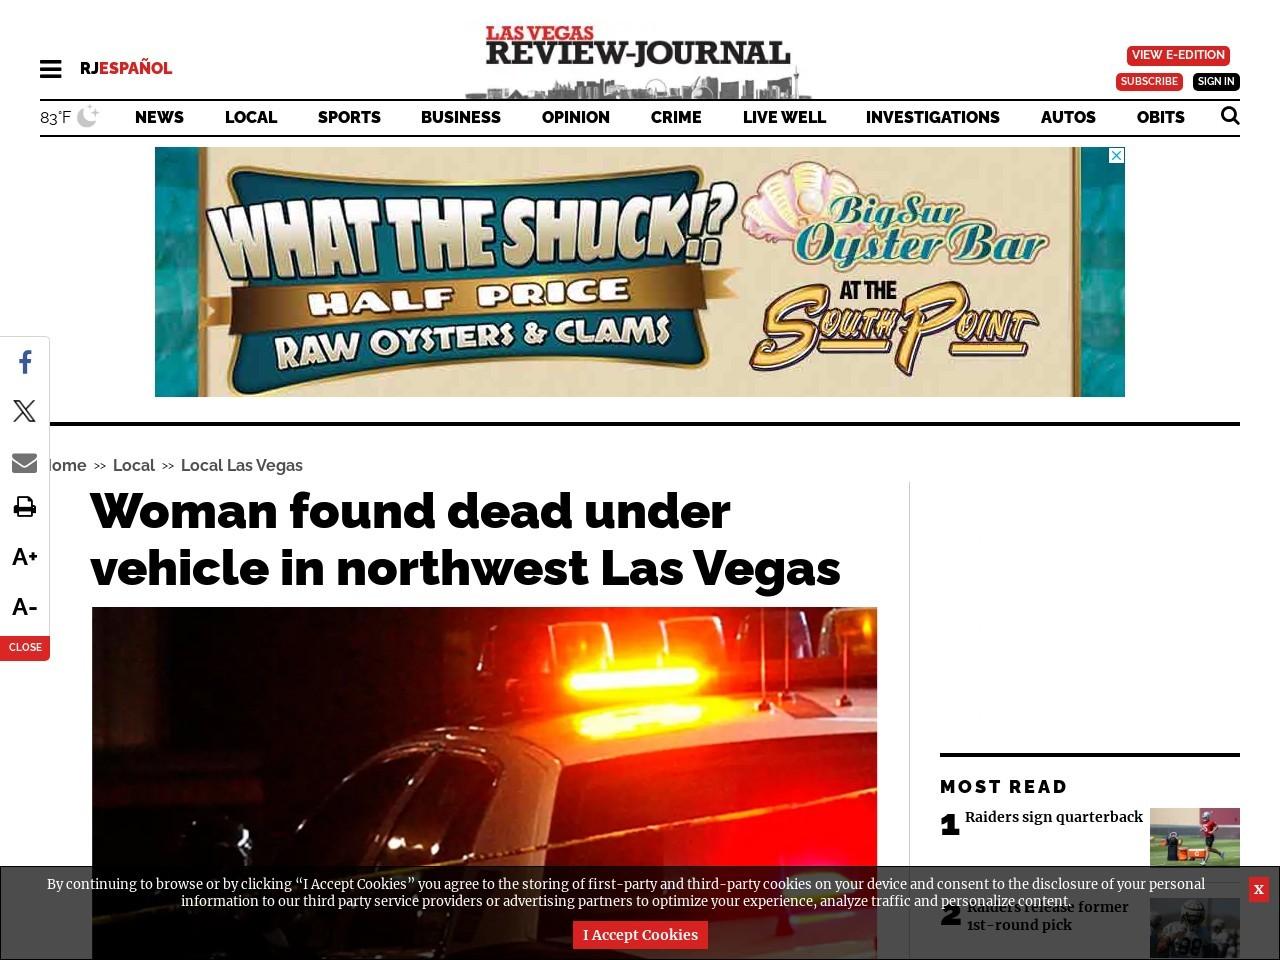 Pedestrian dies after being hit by Jeep in northwest Las Vegas